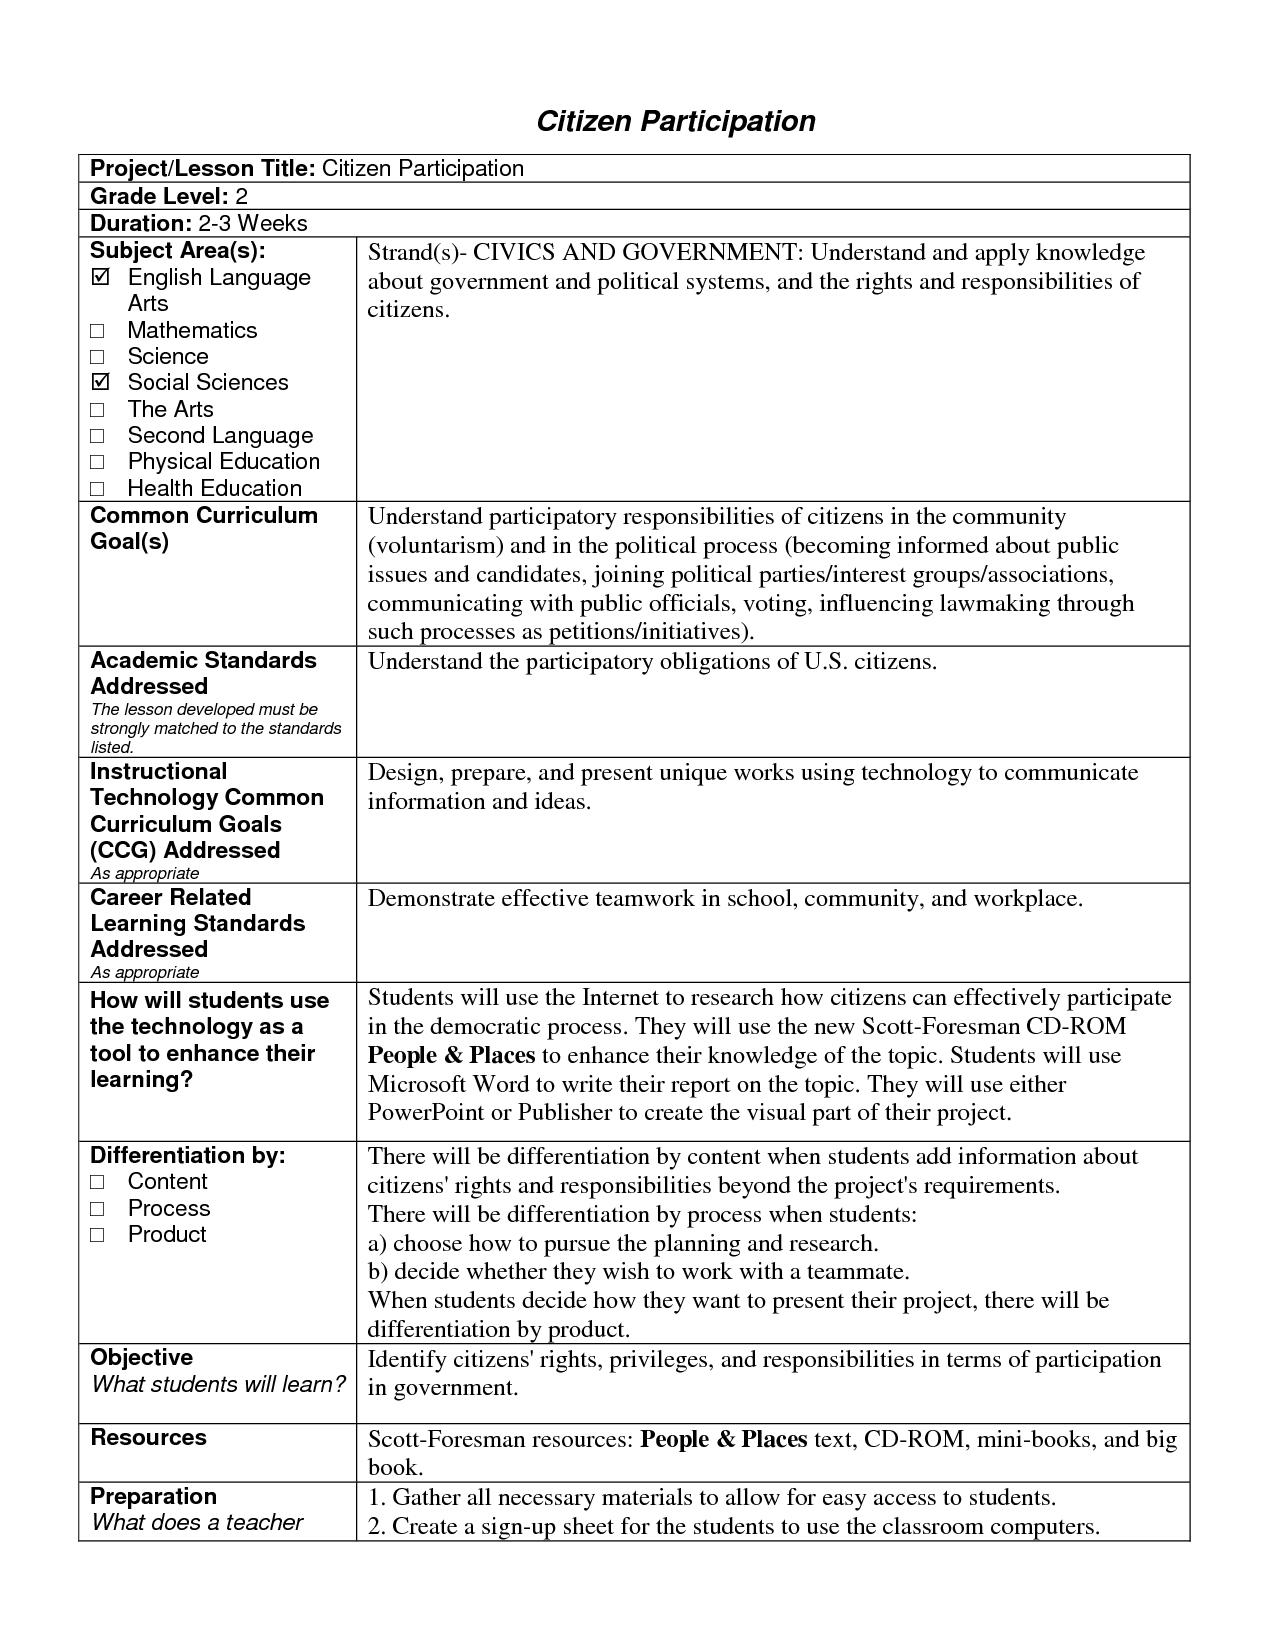 civics lesson plan templates florida standards Ed Tech